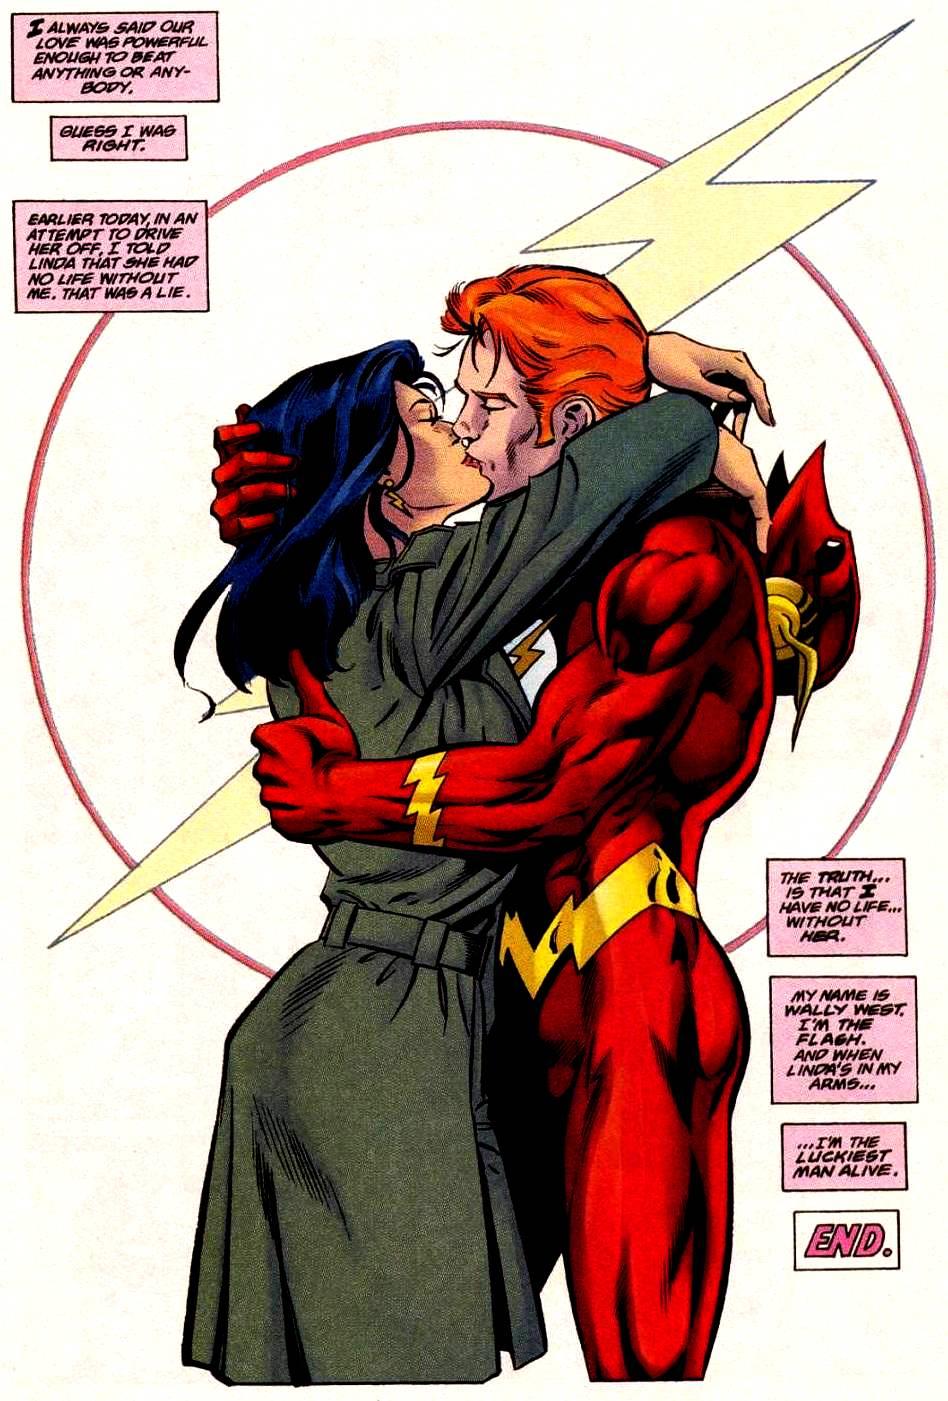 Image - Flash Wally West 0084.jpg | DC Database | Fandom powered by ...